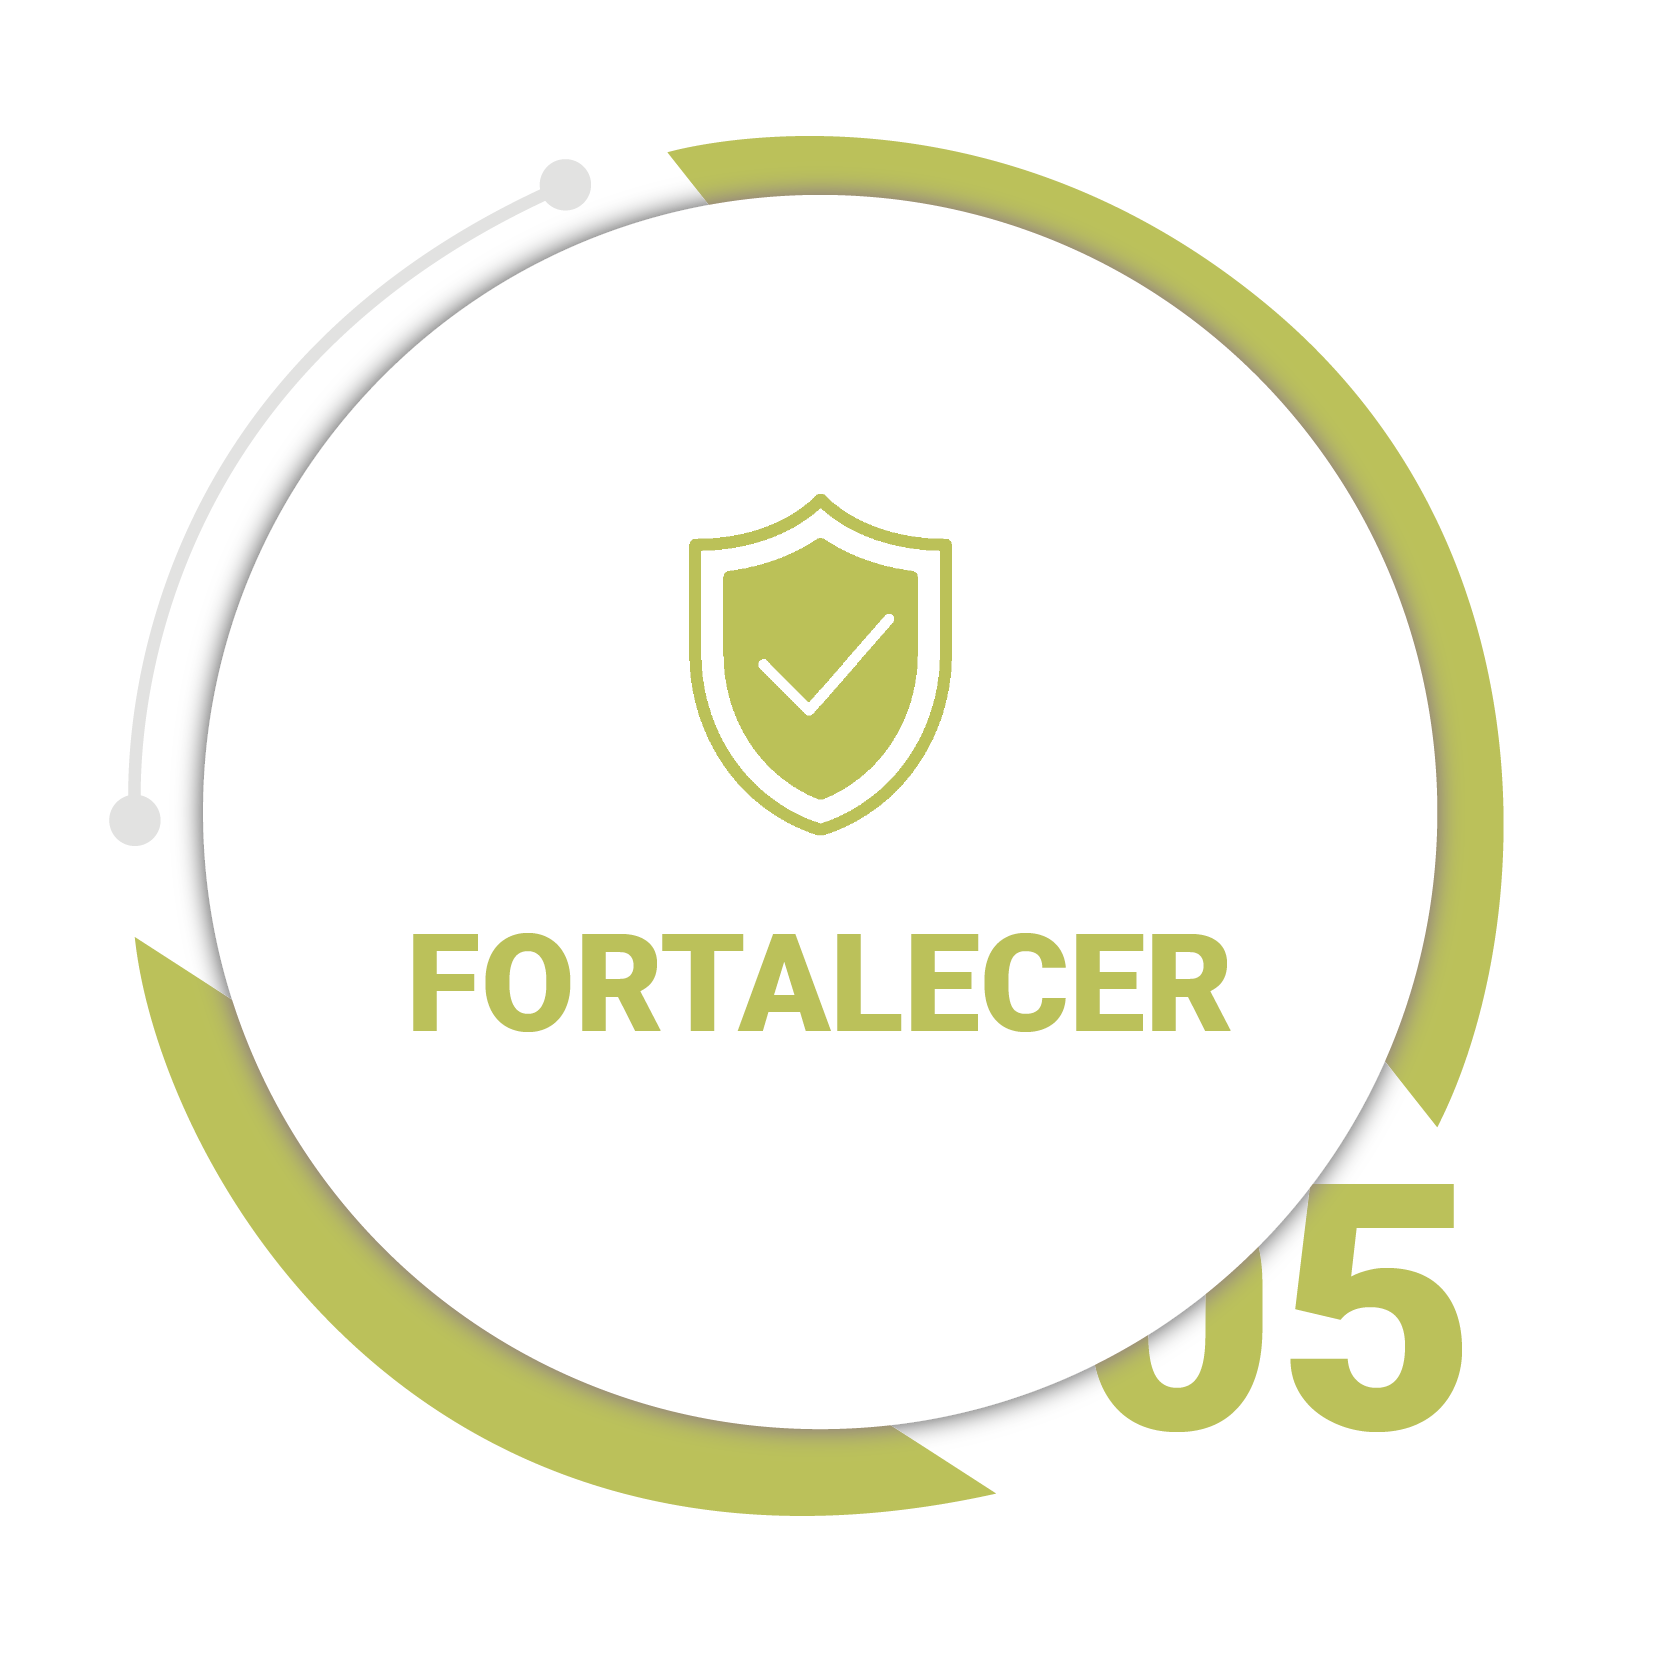 Fortalecer - Ciberseguridad Verne Group